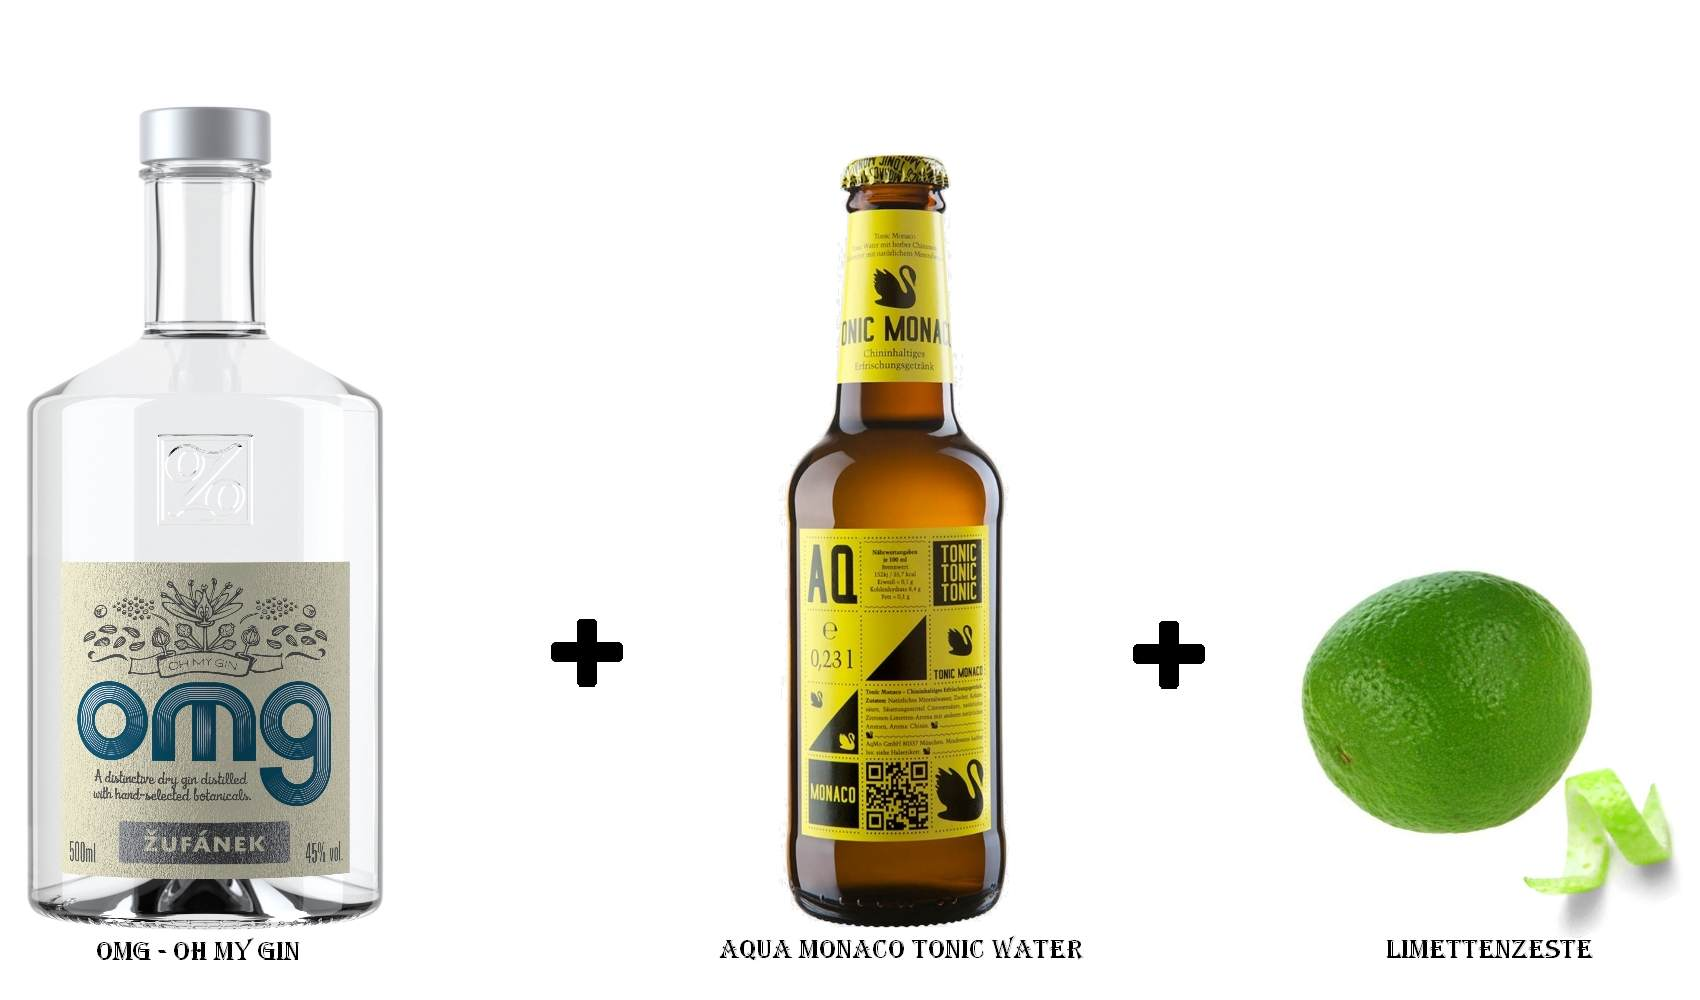 OMG - Oh My Gin + Aqua Monaco Tonic Water + Limettenzeste